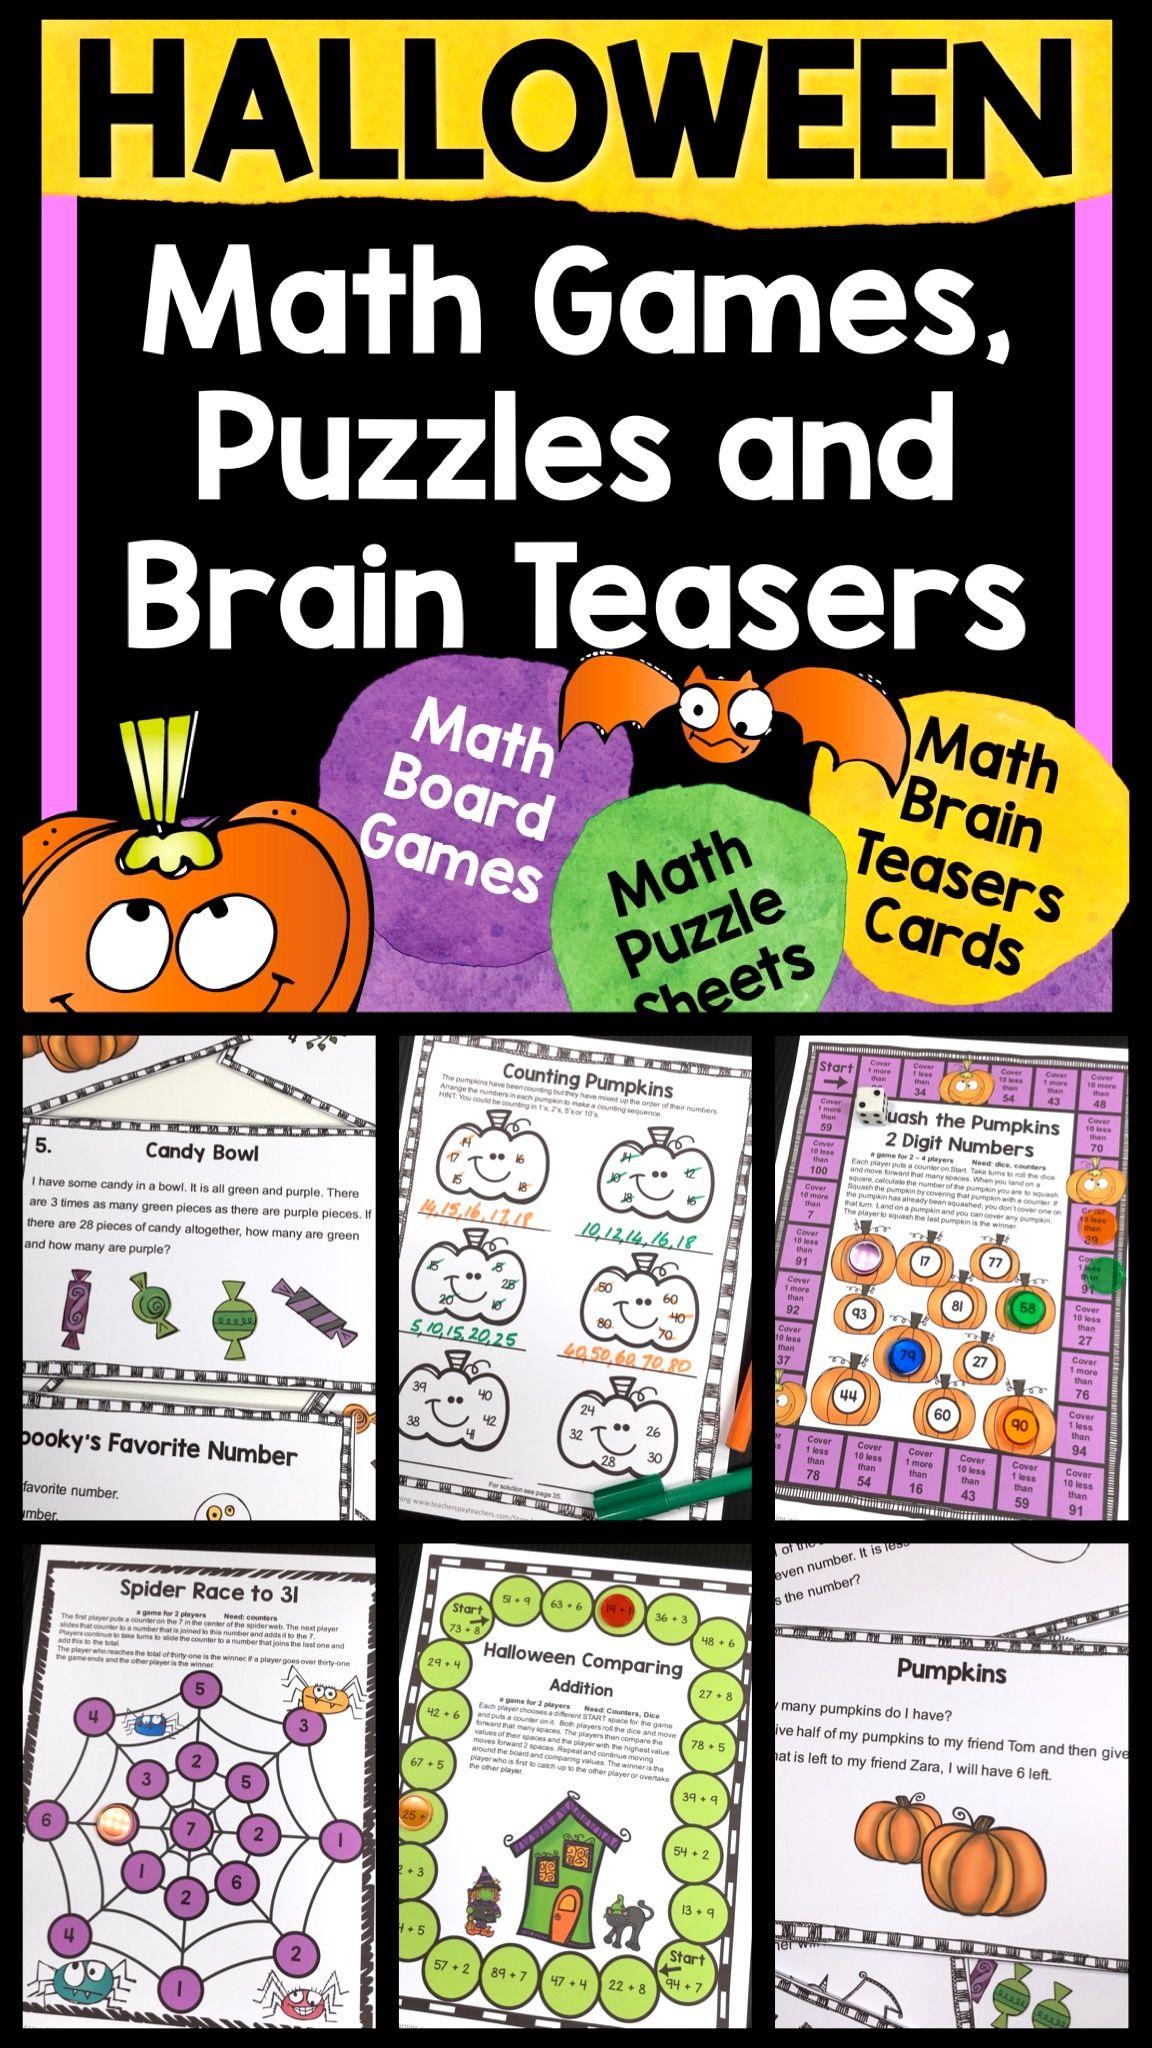 Halloween Activities Halloween Math Games Puzzles And